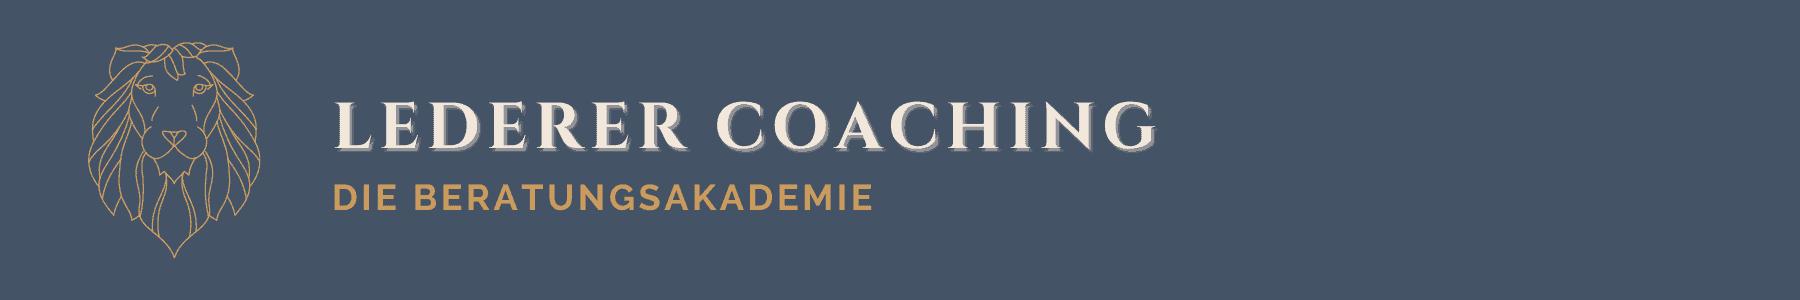 Logo von Lederer.Coaching